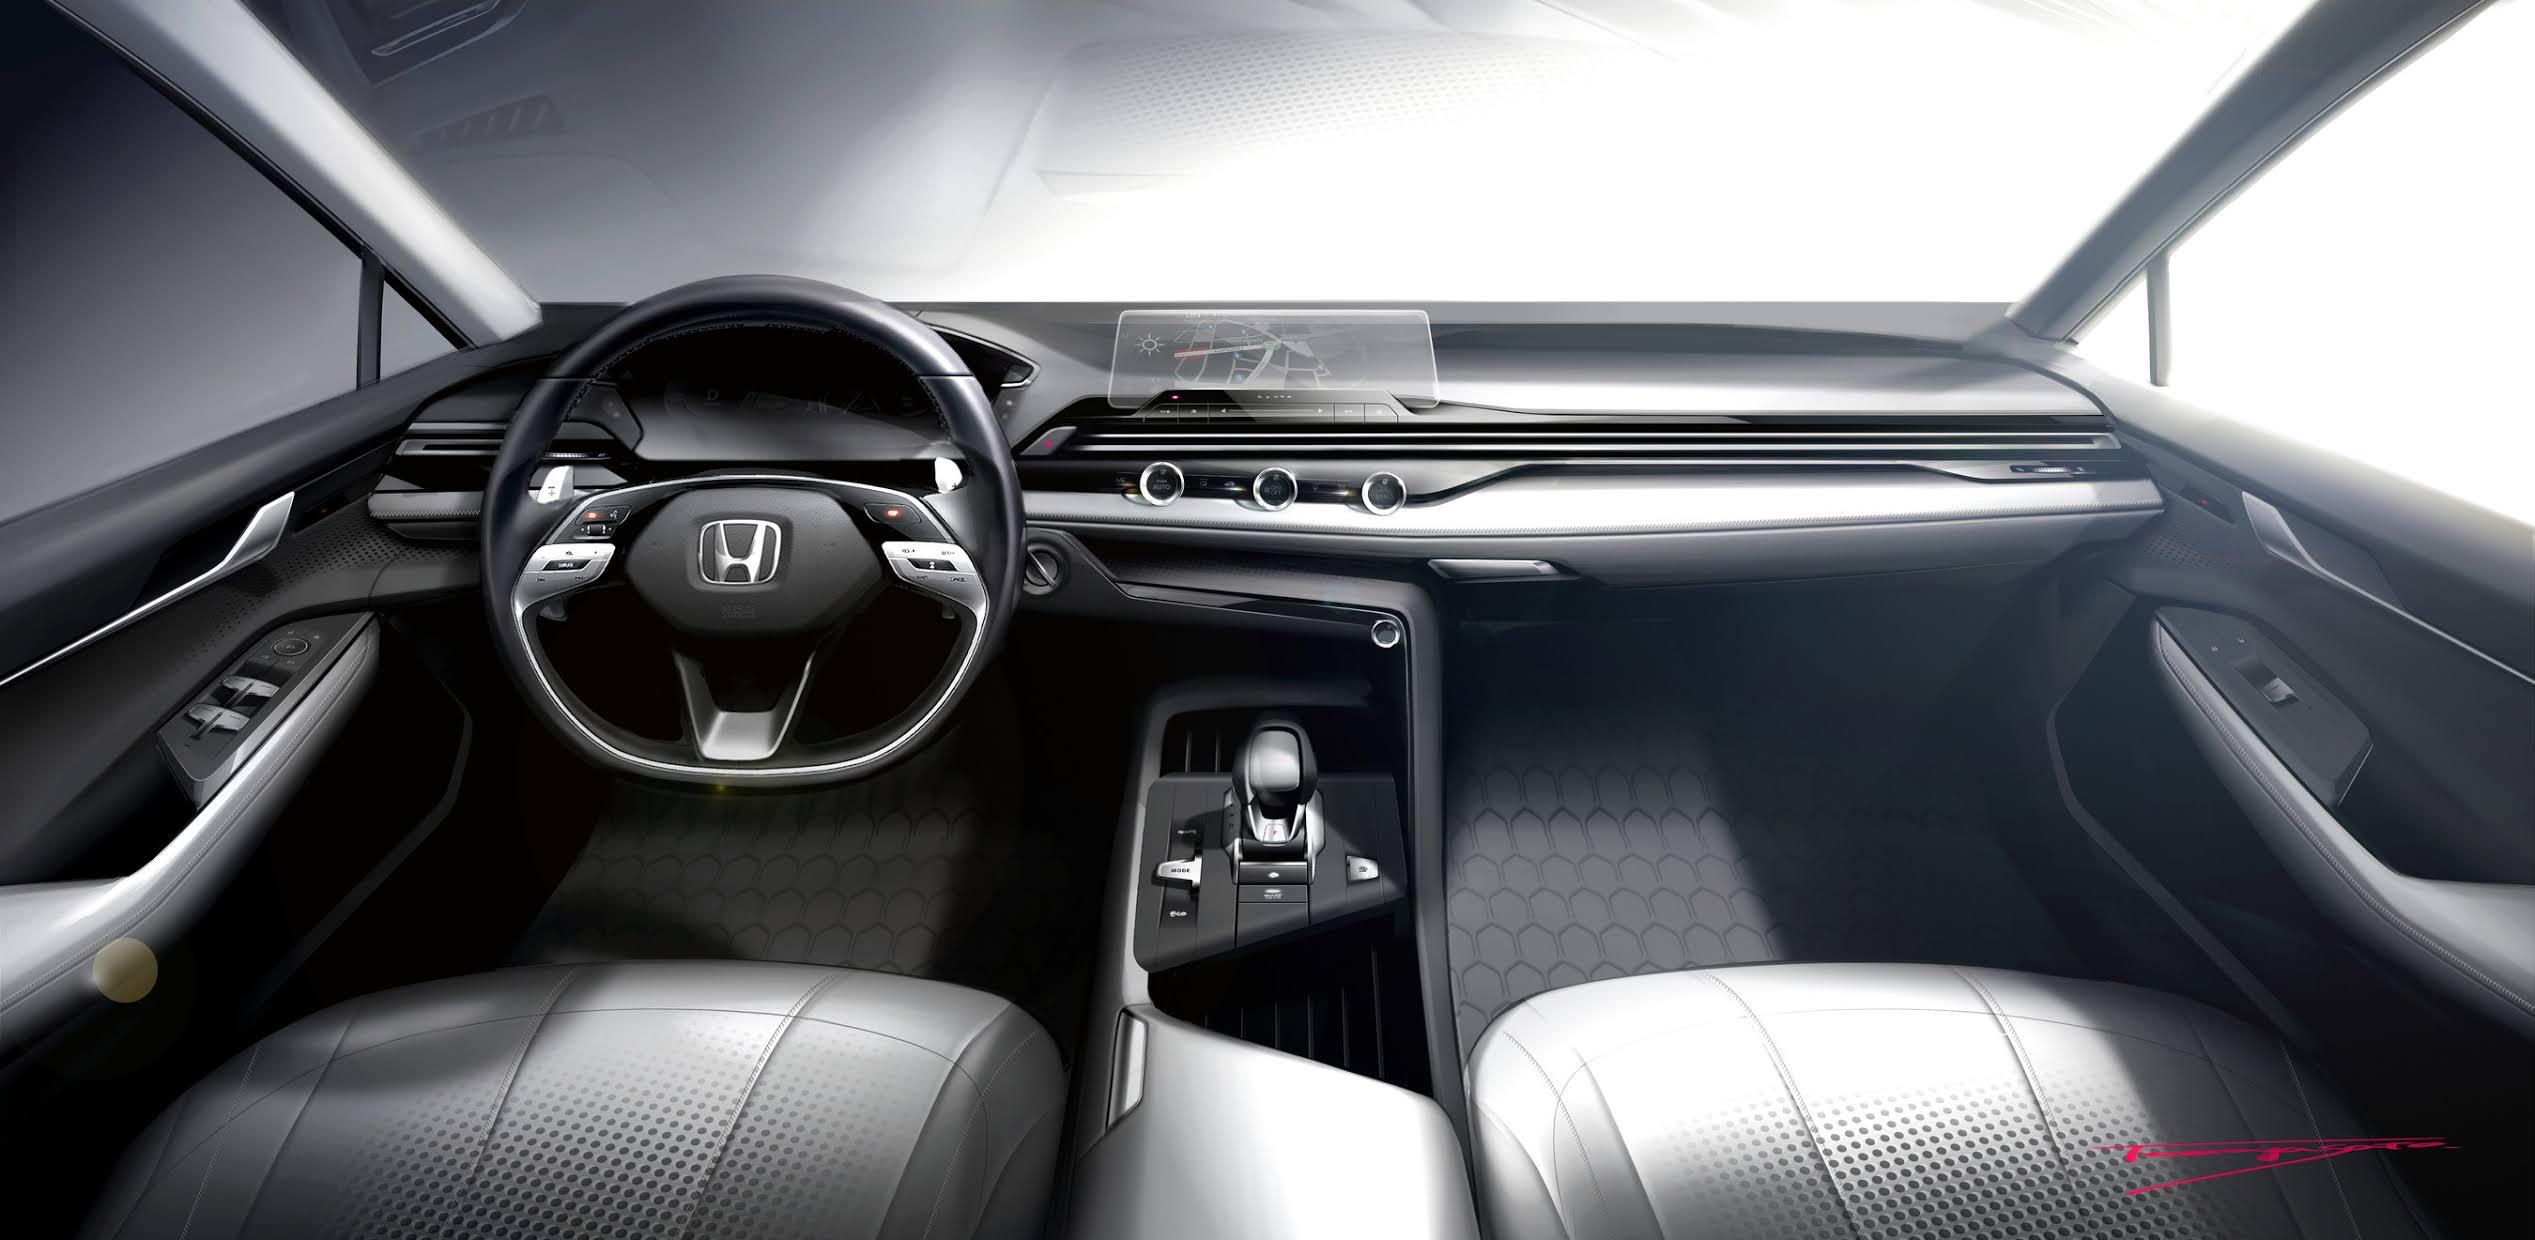 Honda Releases Video Revealing New Interior Design Philosophy